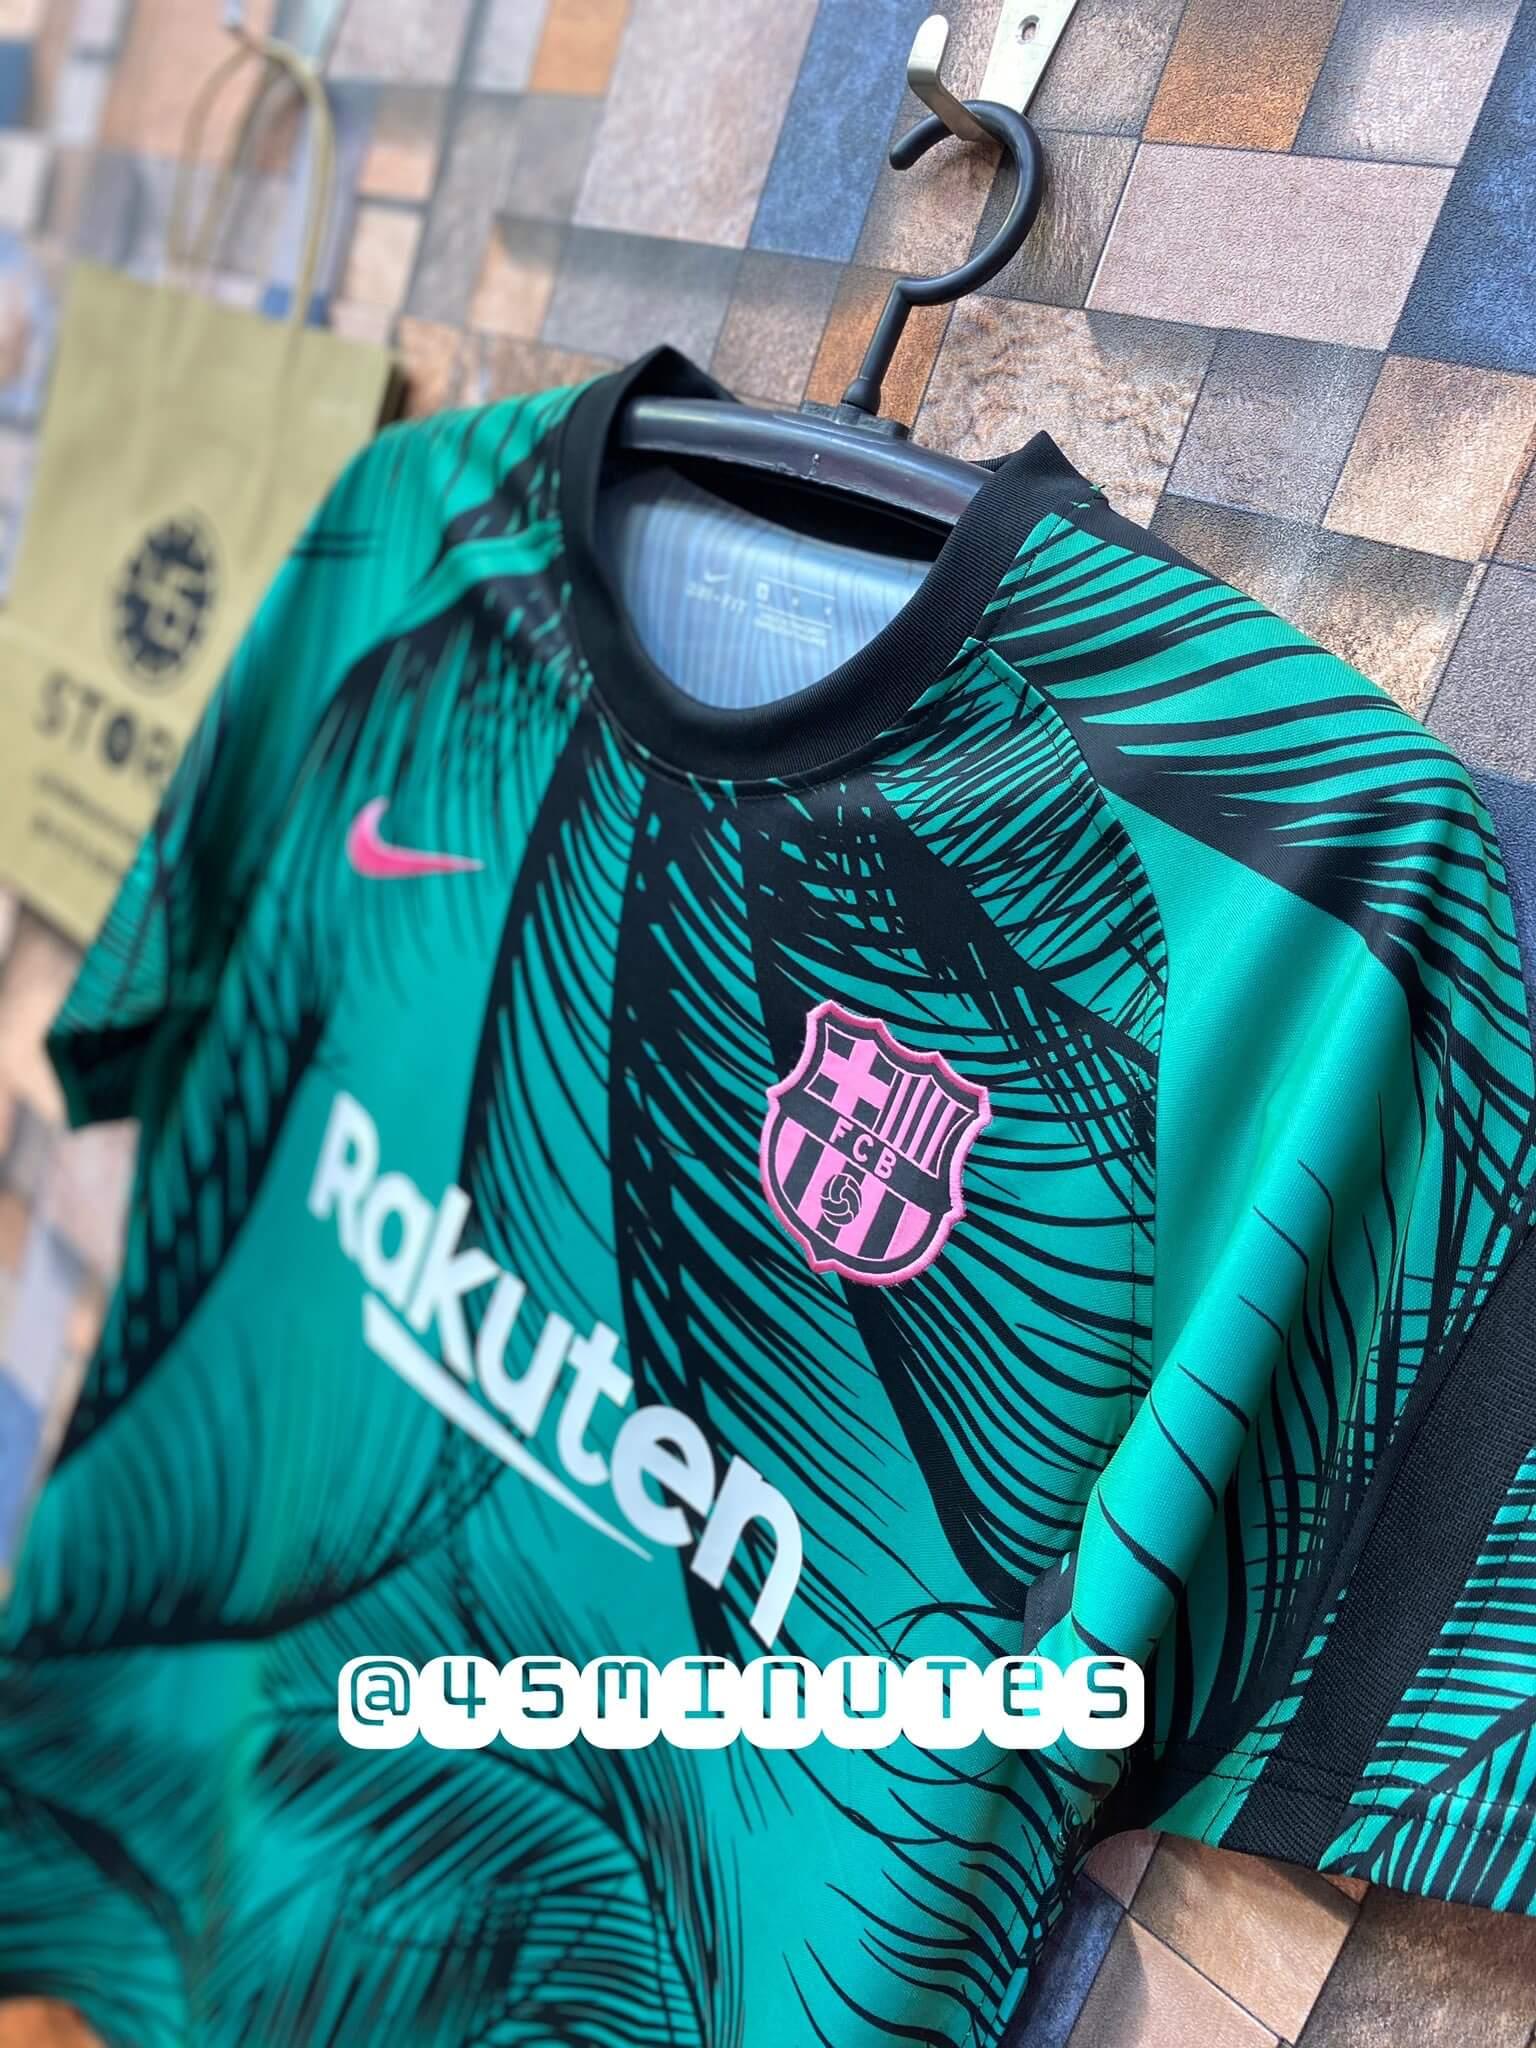 Barcelona Pre UCL Jersey(Kit) 2020 2021 Tanzania   Jezi za Barca 2020/21